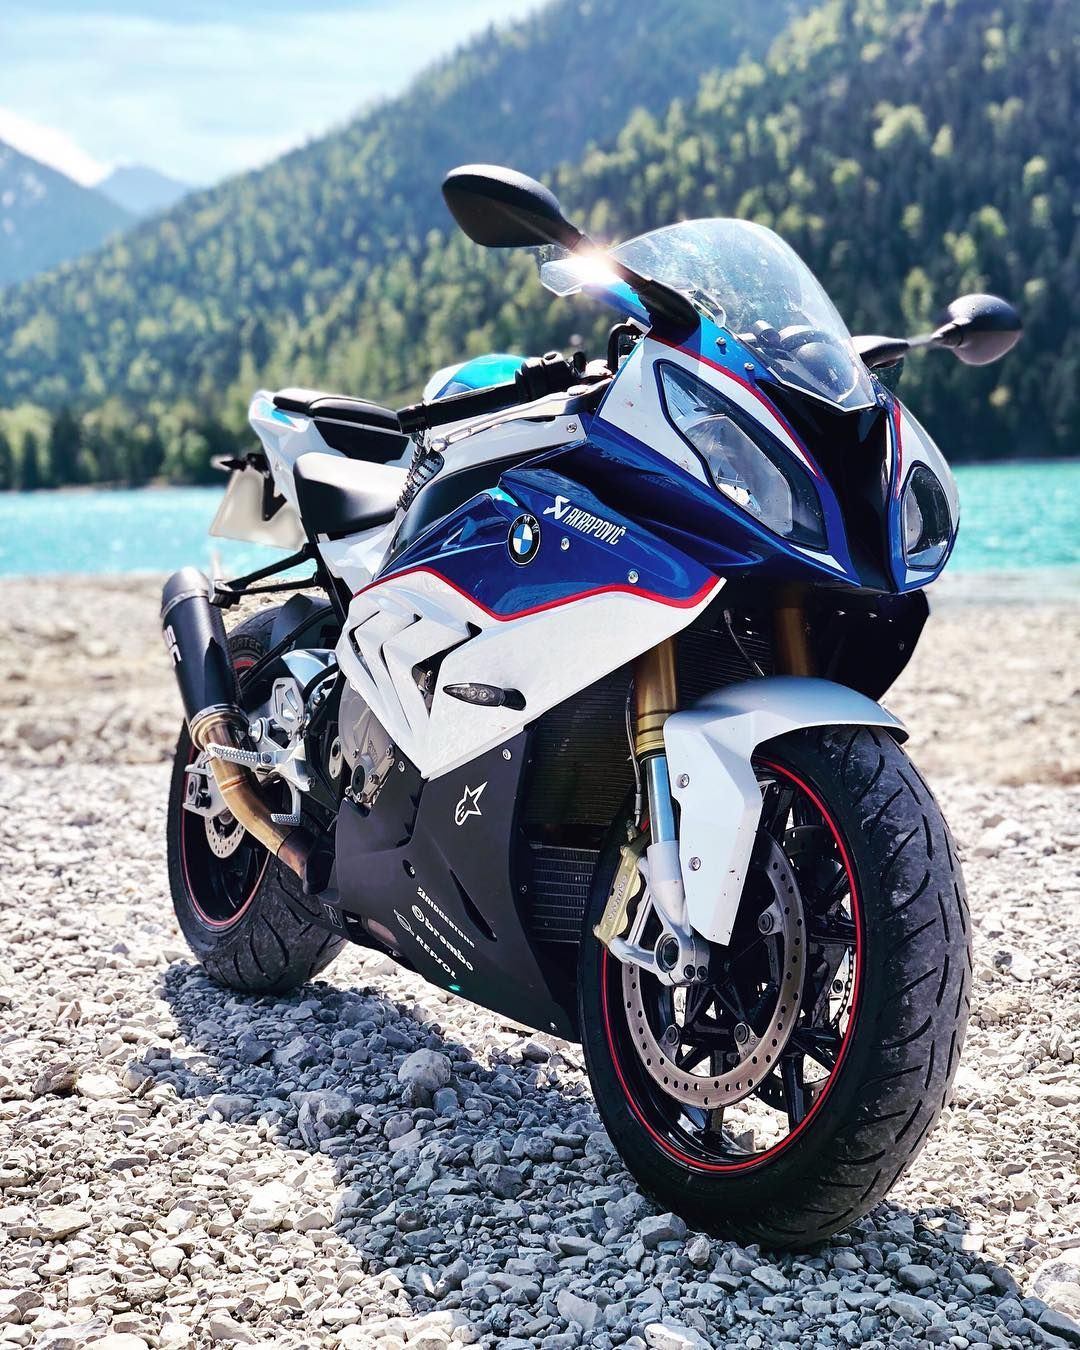 Suzuki Kawasaki Bmw Ducati Yamaha Ktm Honda Augusta Bmws1000rr S1000rr Bmw Motocy Bike Bmw Bmw S1000rr Ducati Superbike